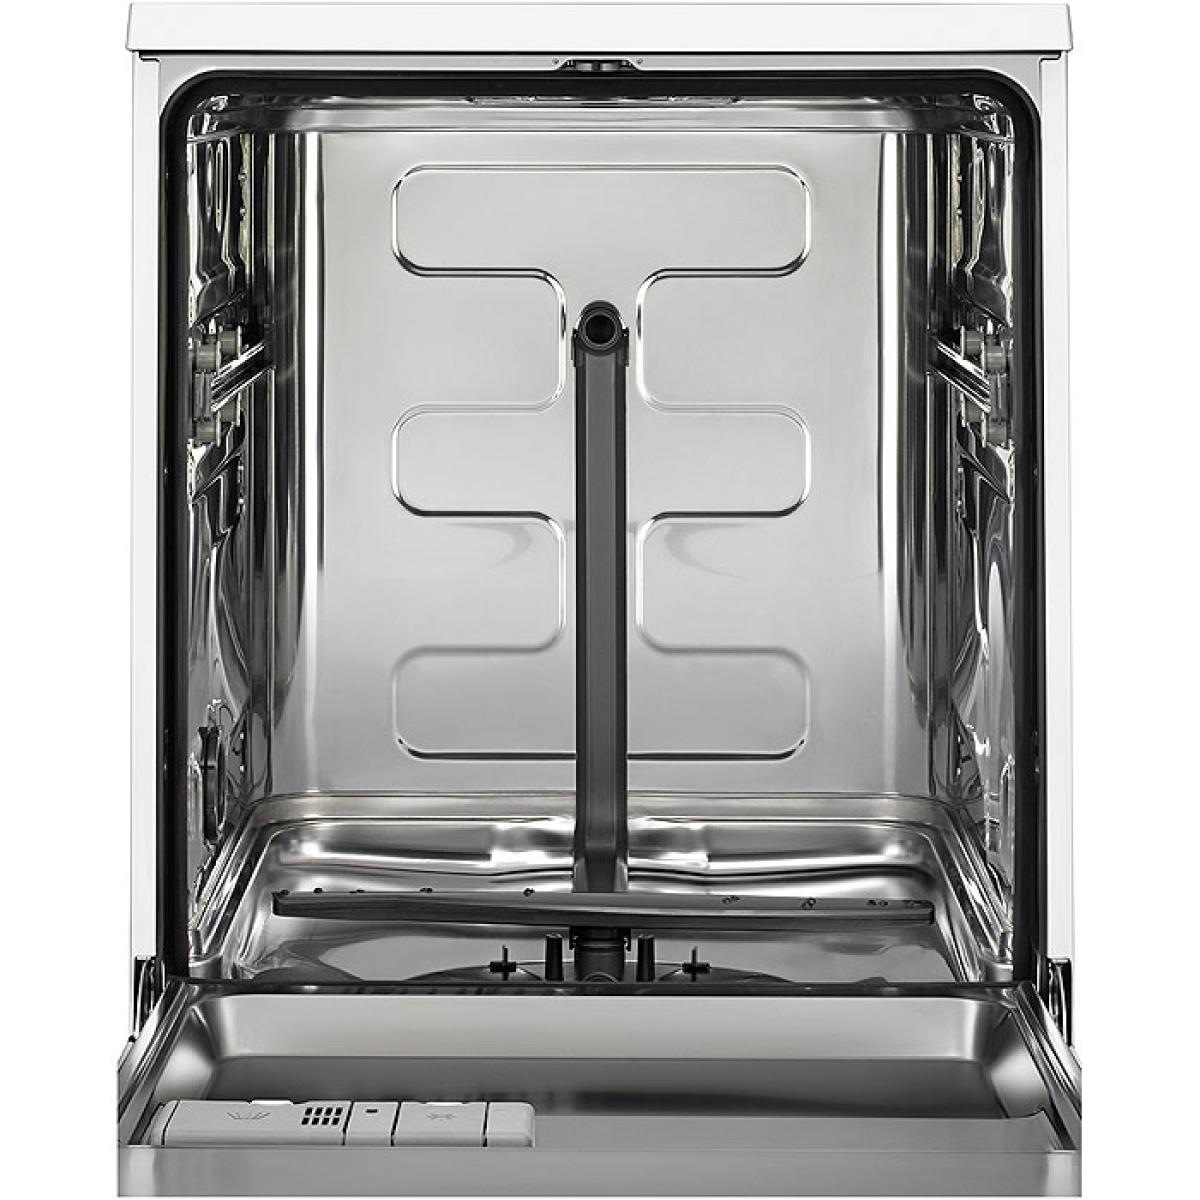 aeg fse53600z geschirrsp ler 60cm vollintegrierbar 44db ab 7 l a g nstig kaufen. Black Bedroom Furniture Sets. Home Design Ideas